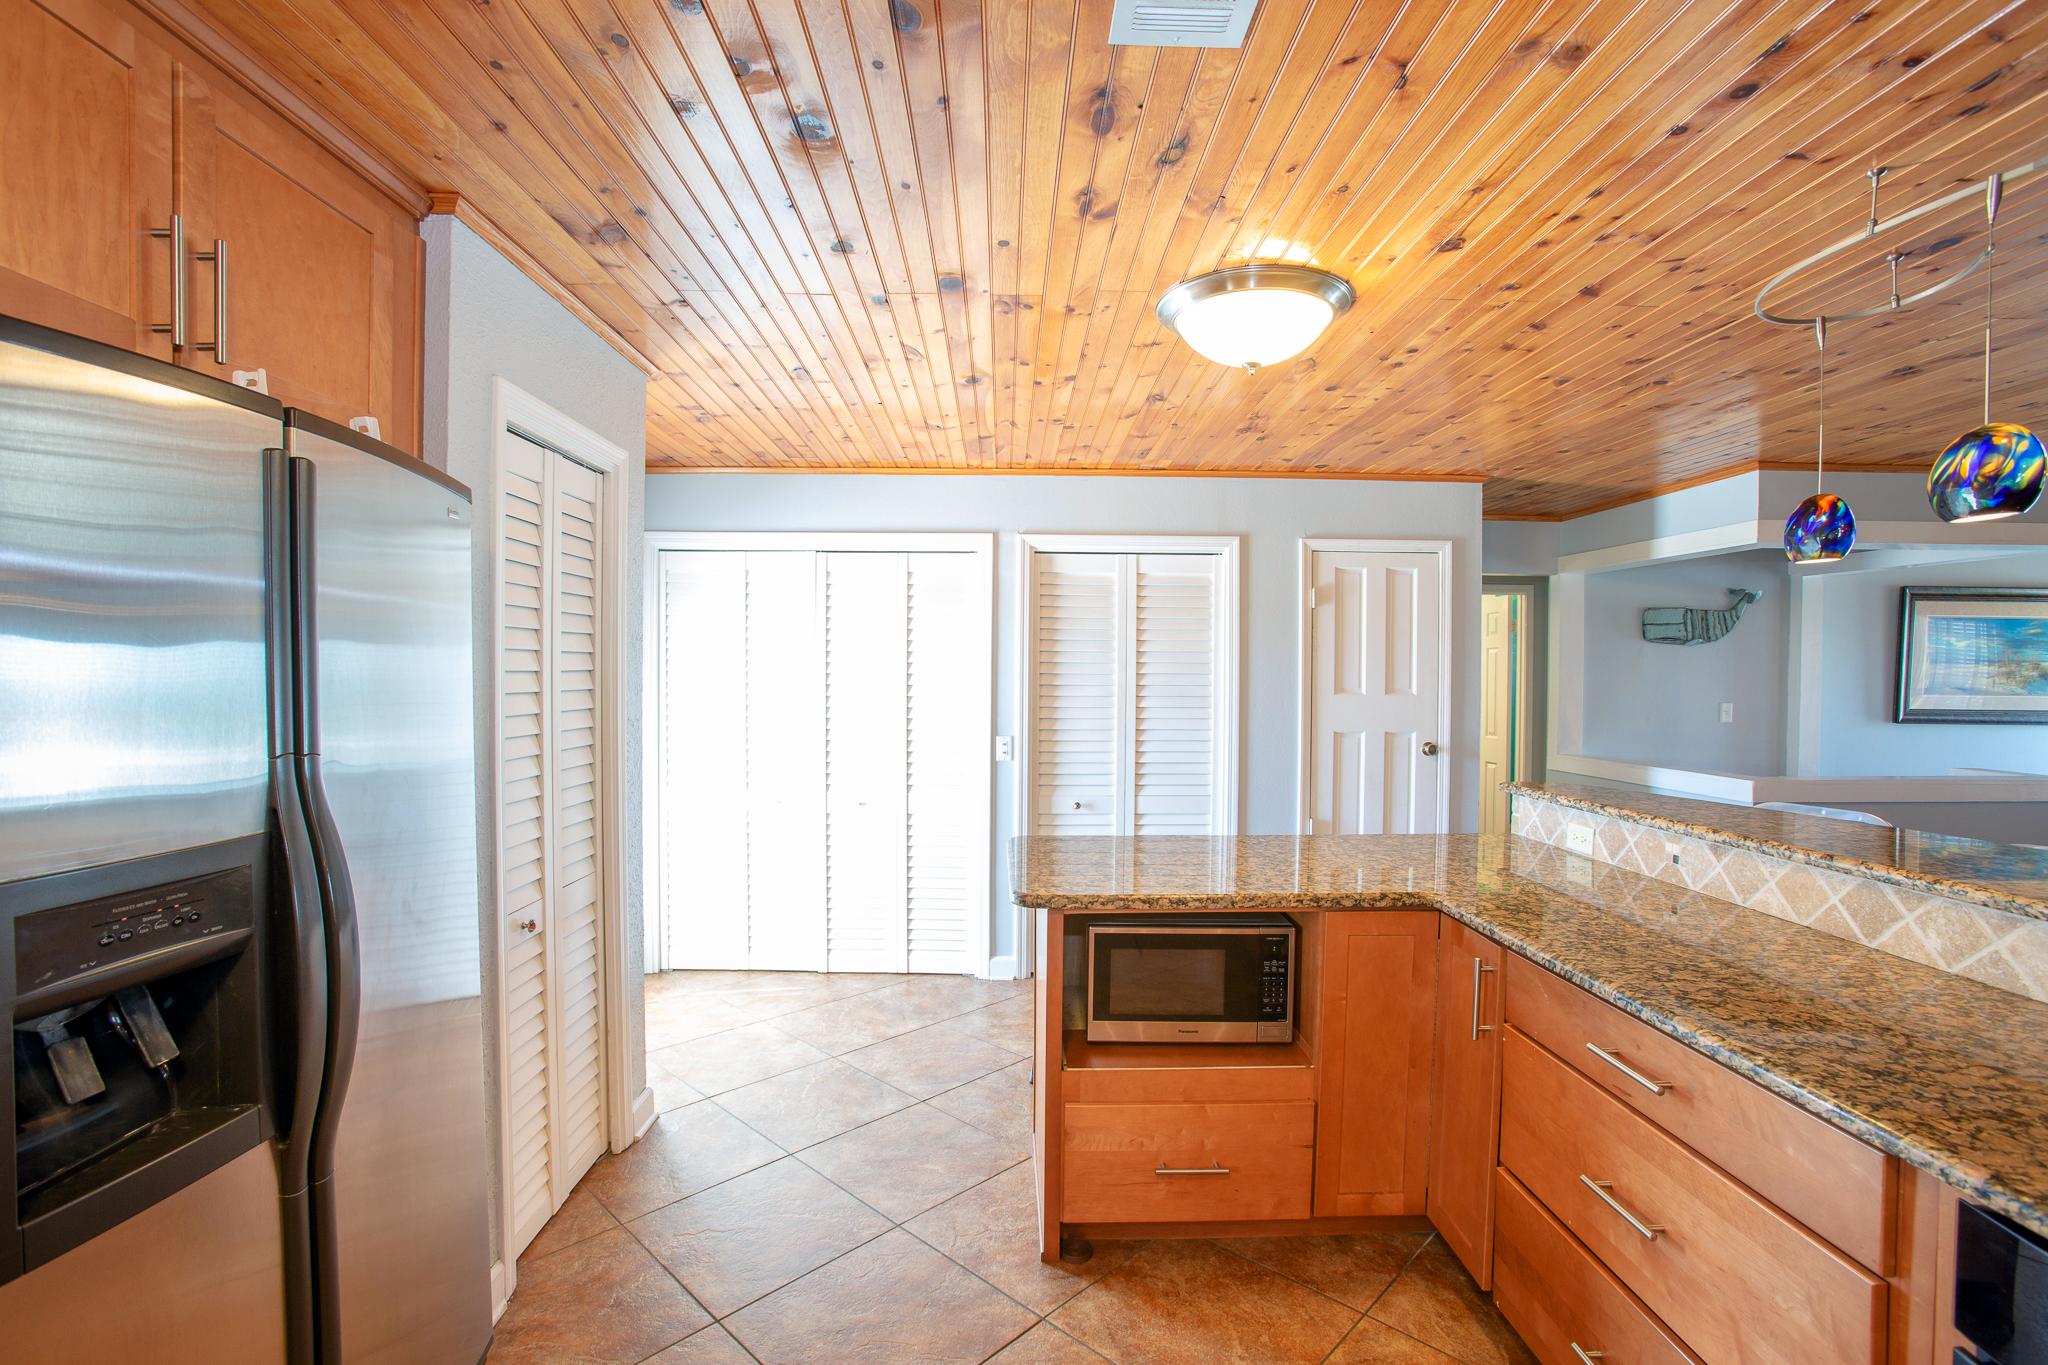 Maldonado 1015 - Sea the Big Picture House/Cottage rental in Pensacola Beach House Rentals in Pensacola Beach Florida - #10